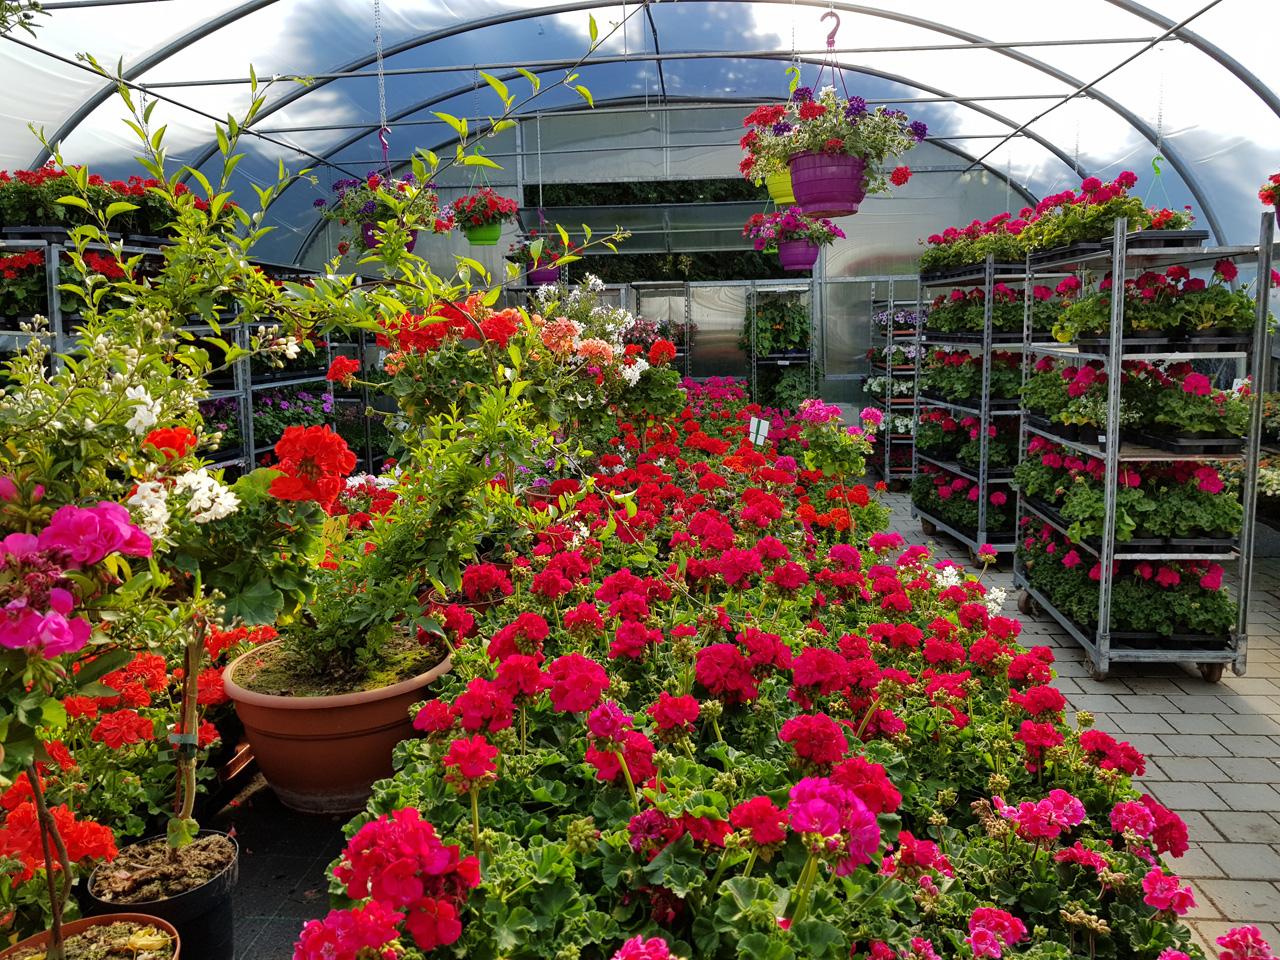 Gartenpflanzen deegs Pflanzenwelt